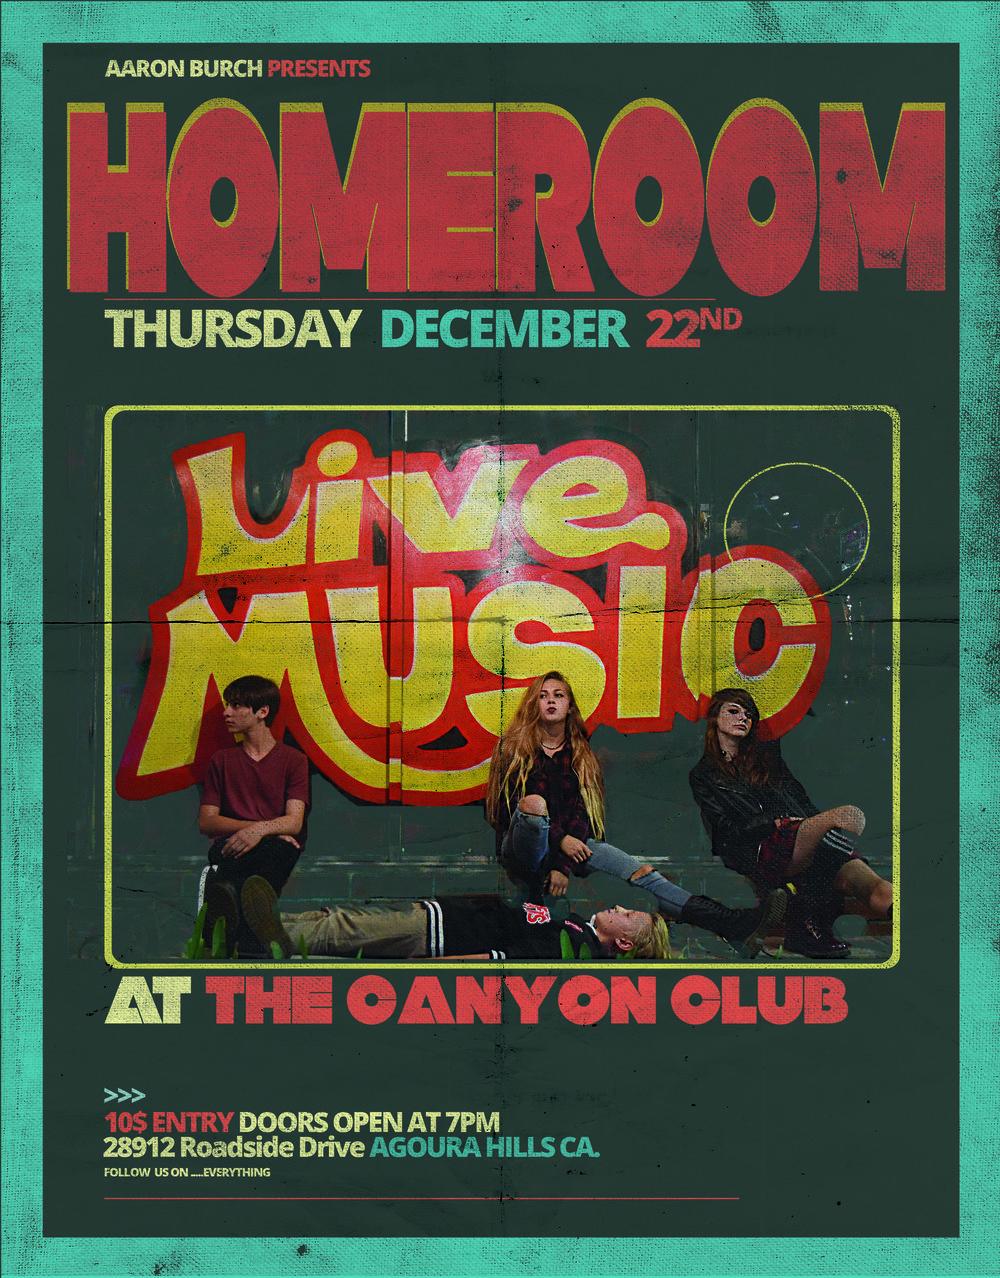 Home Room Canyon Club Flyer.jpg